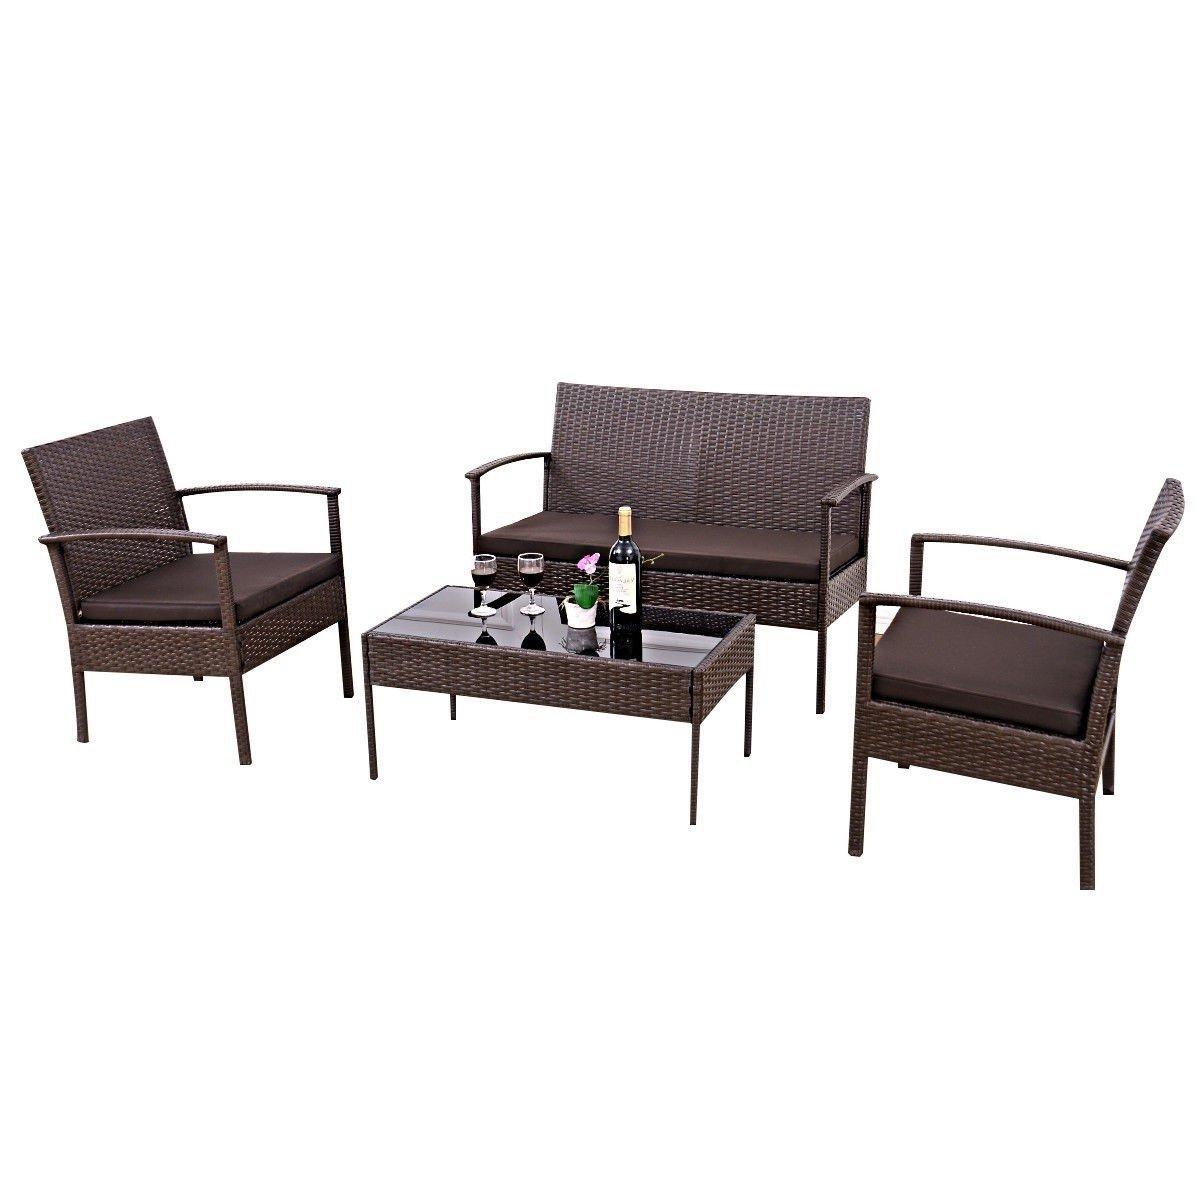 Brown 4 Piece Outdoor Rattan Patio Furniture Set In 2020